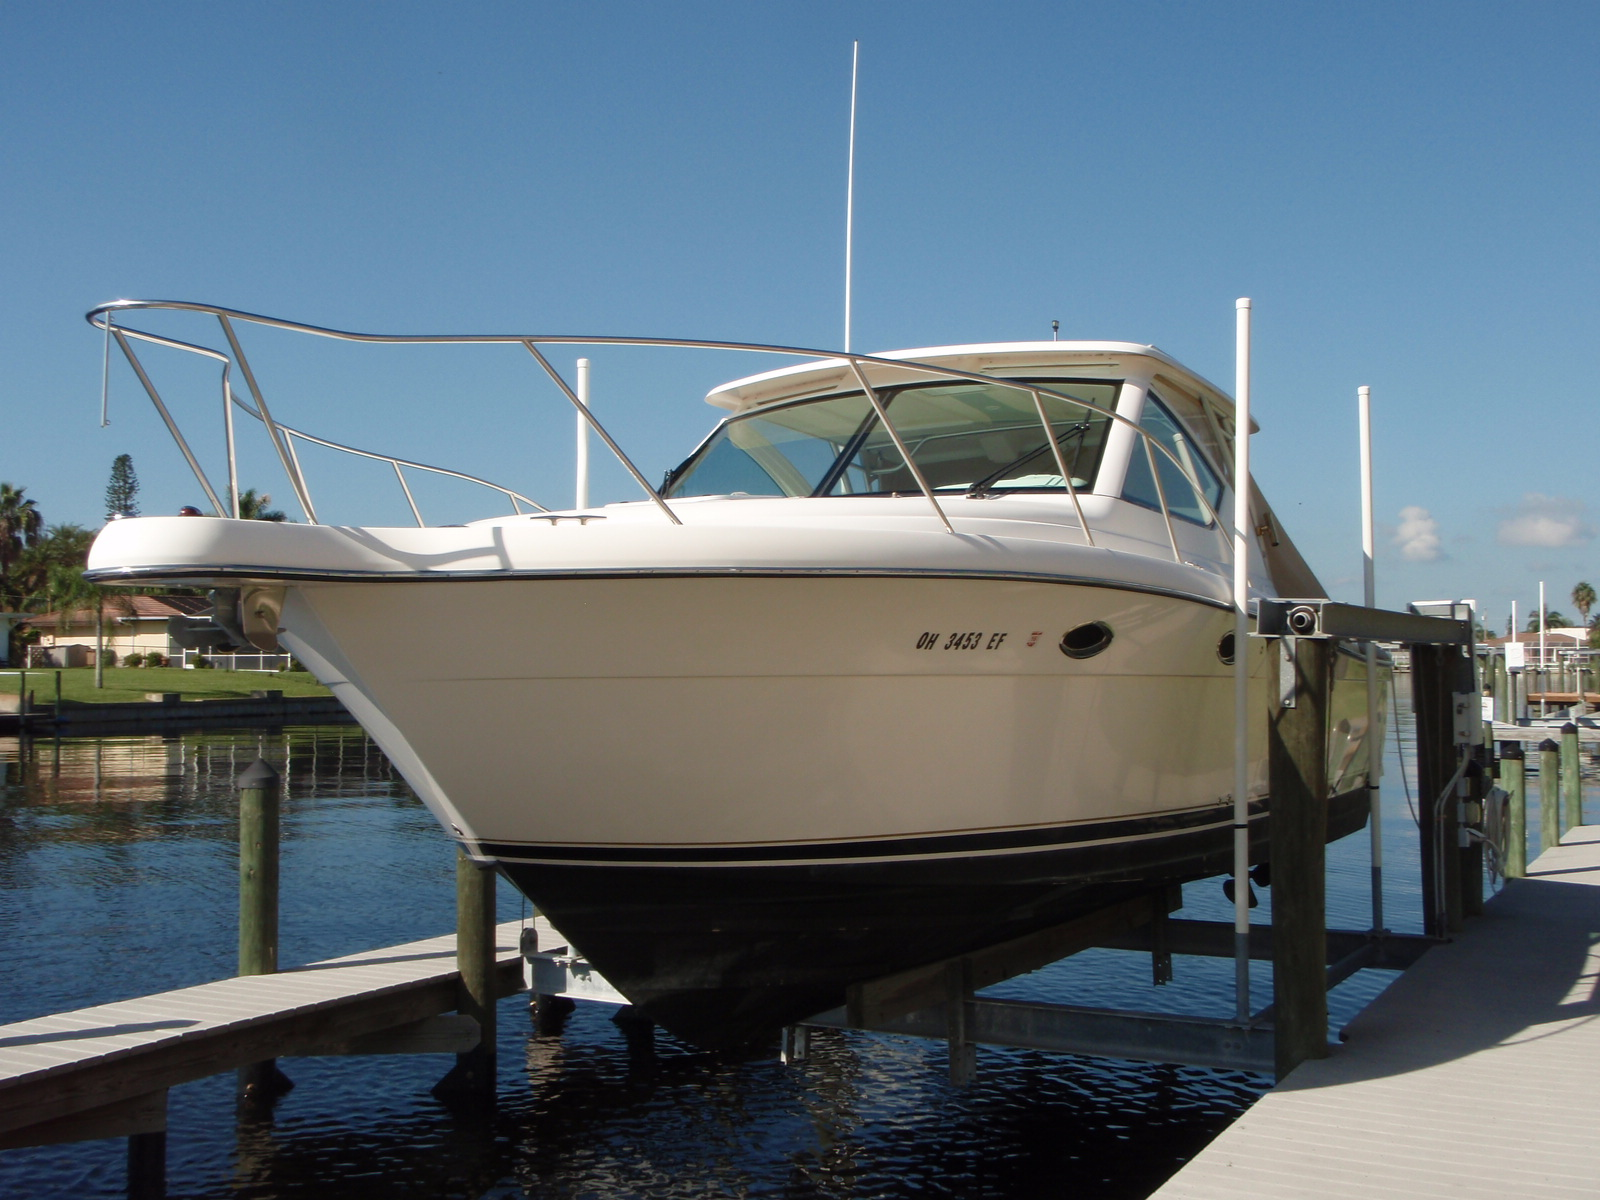 Home Tiarayachts4sale Comtiarayachts4sale Com Wayne Lea Yacht Broker